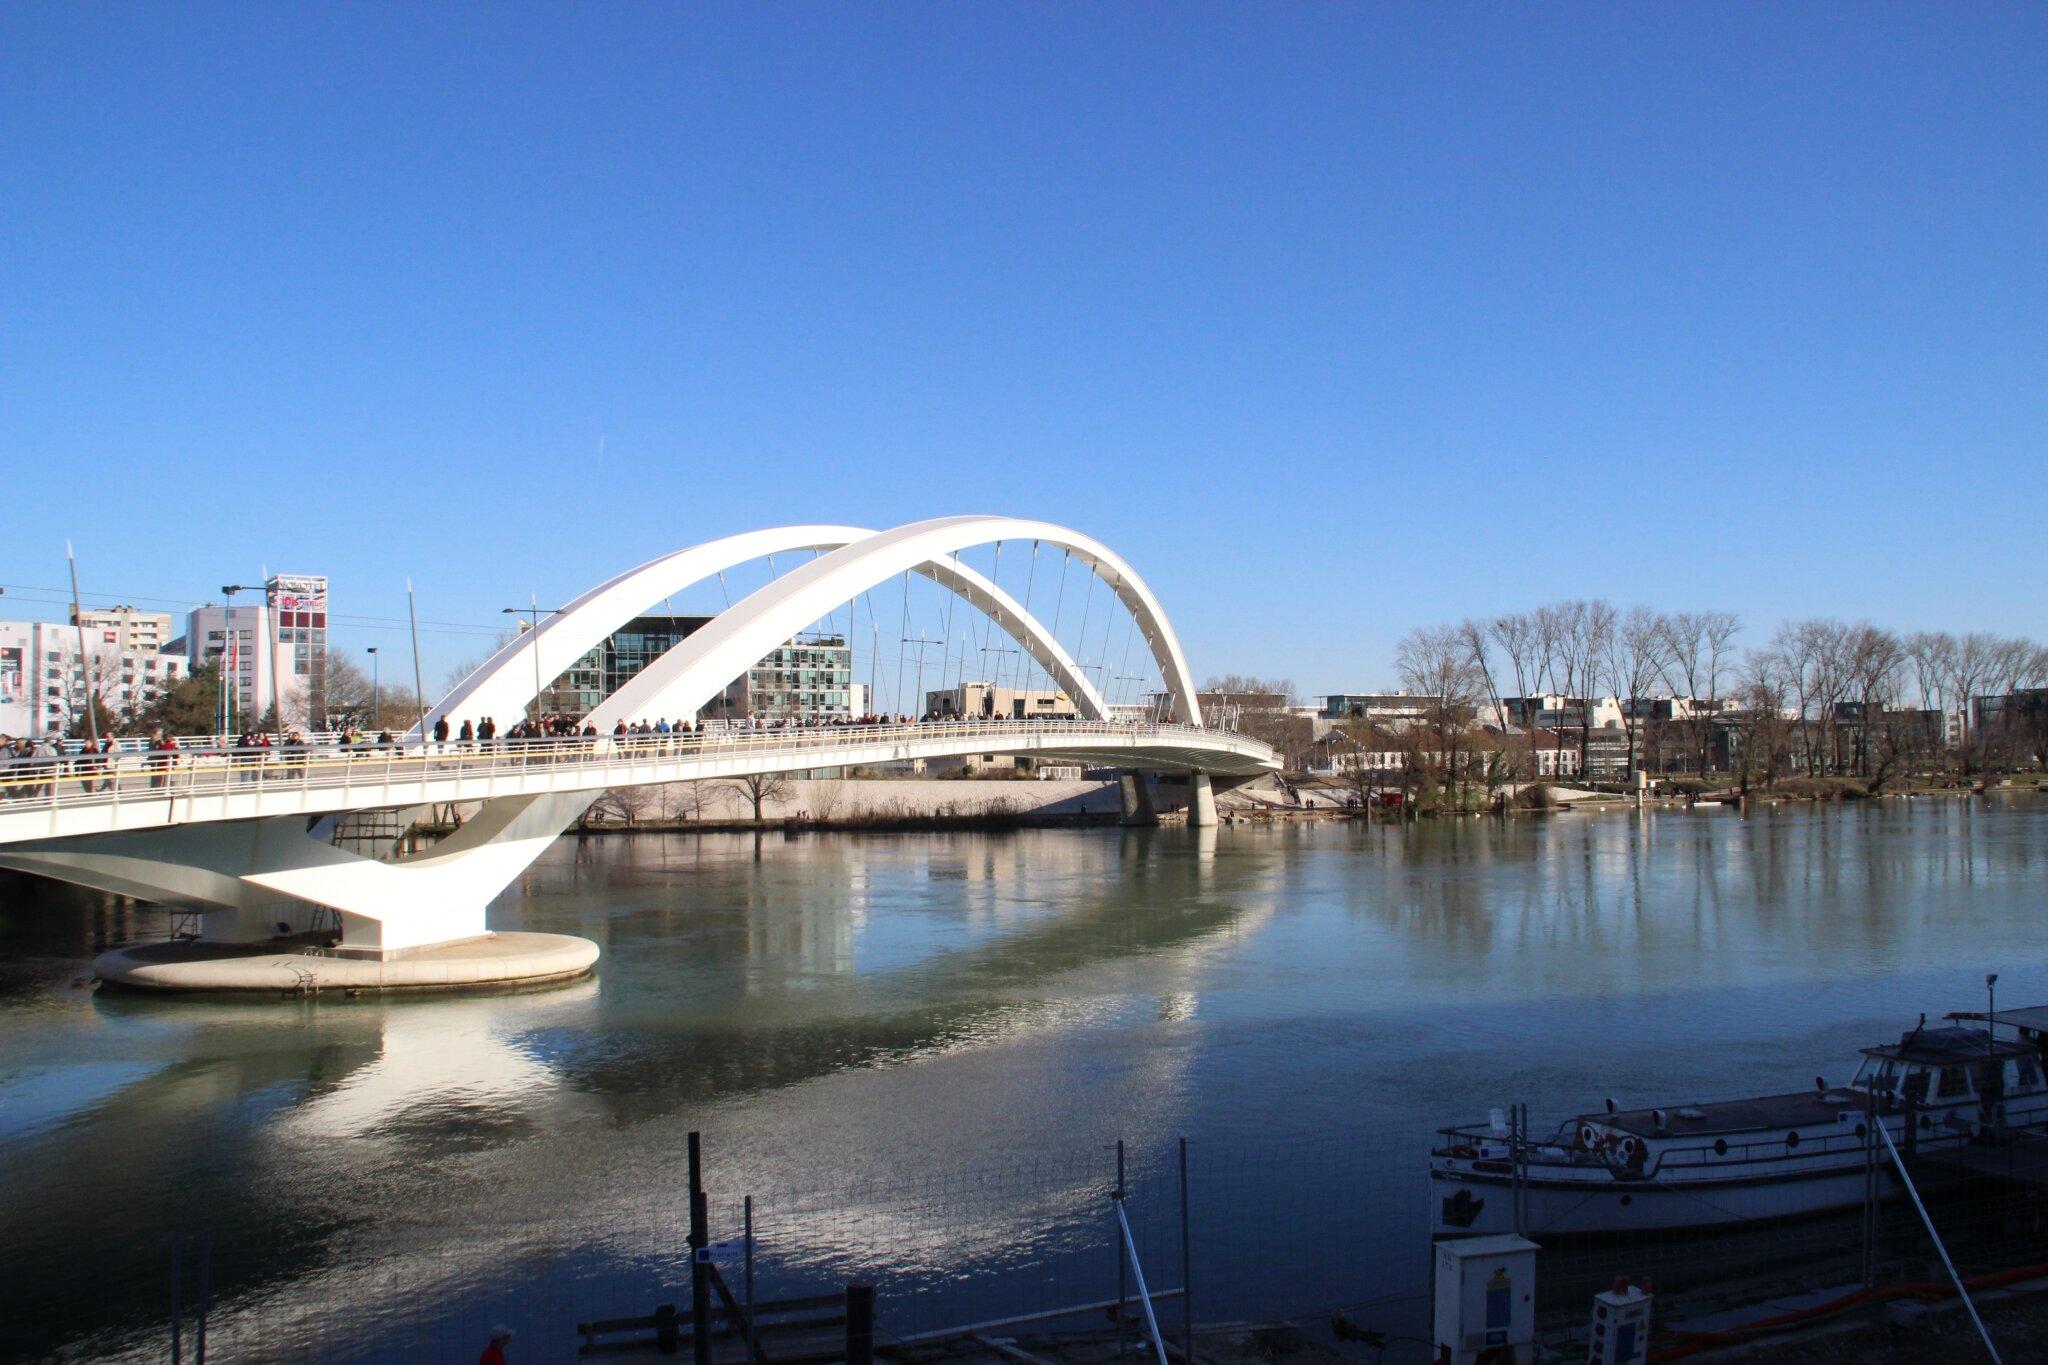 Confluence Pont Raymond Bard